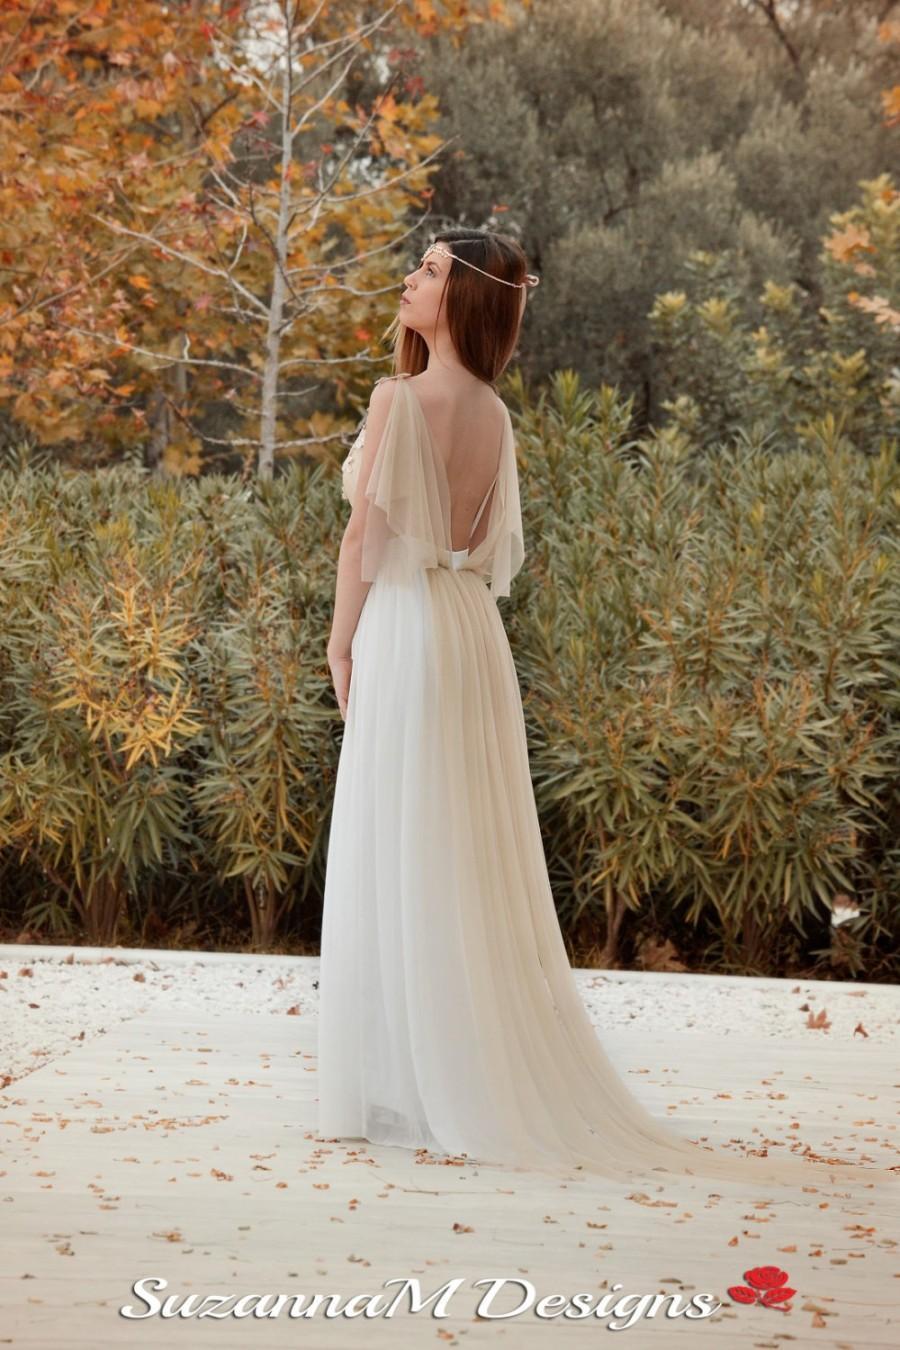 fairy wedding dress patterns fairy wedding dress Disney Wedding Dresses Dressed Up Girl